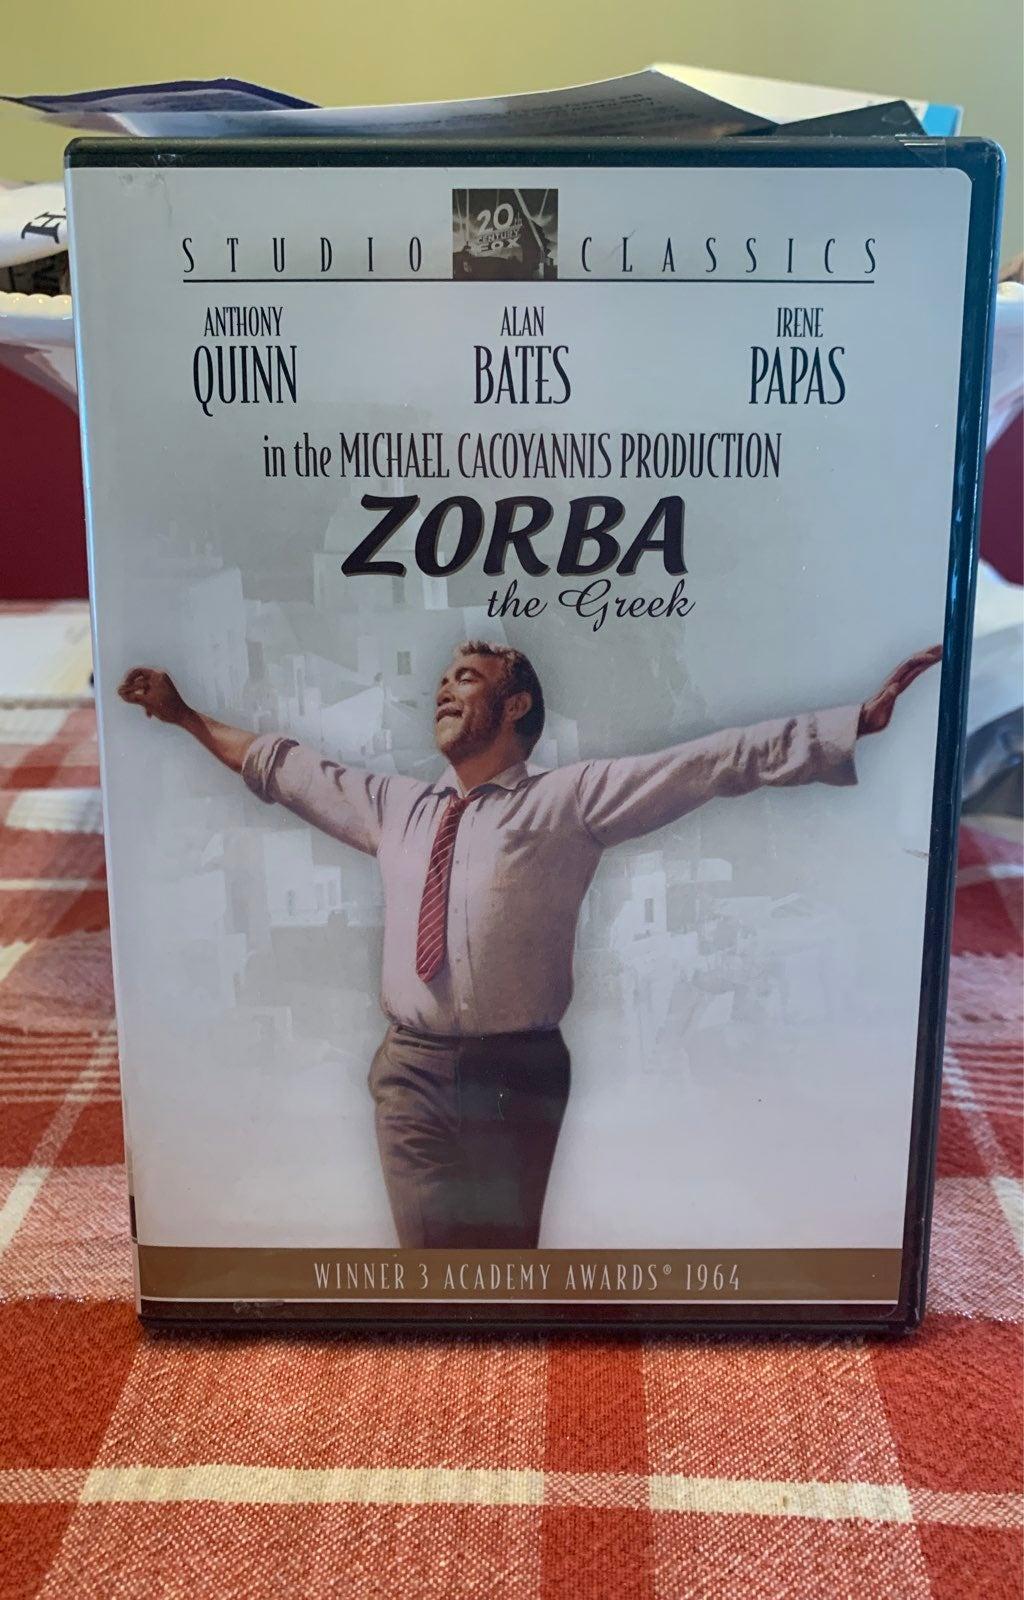 ZORBA THE GREEK DVD TESTED LIKE NEW